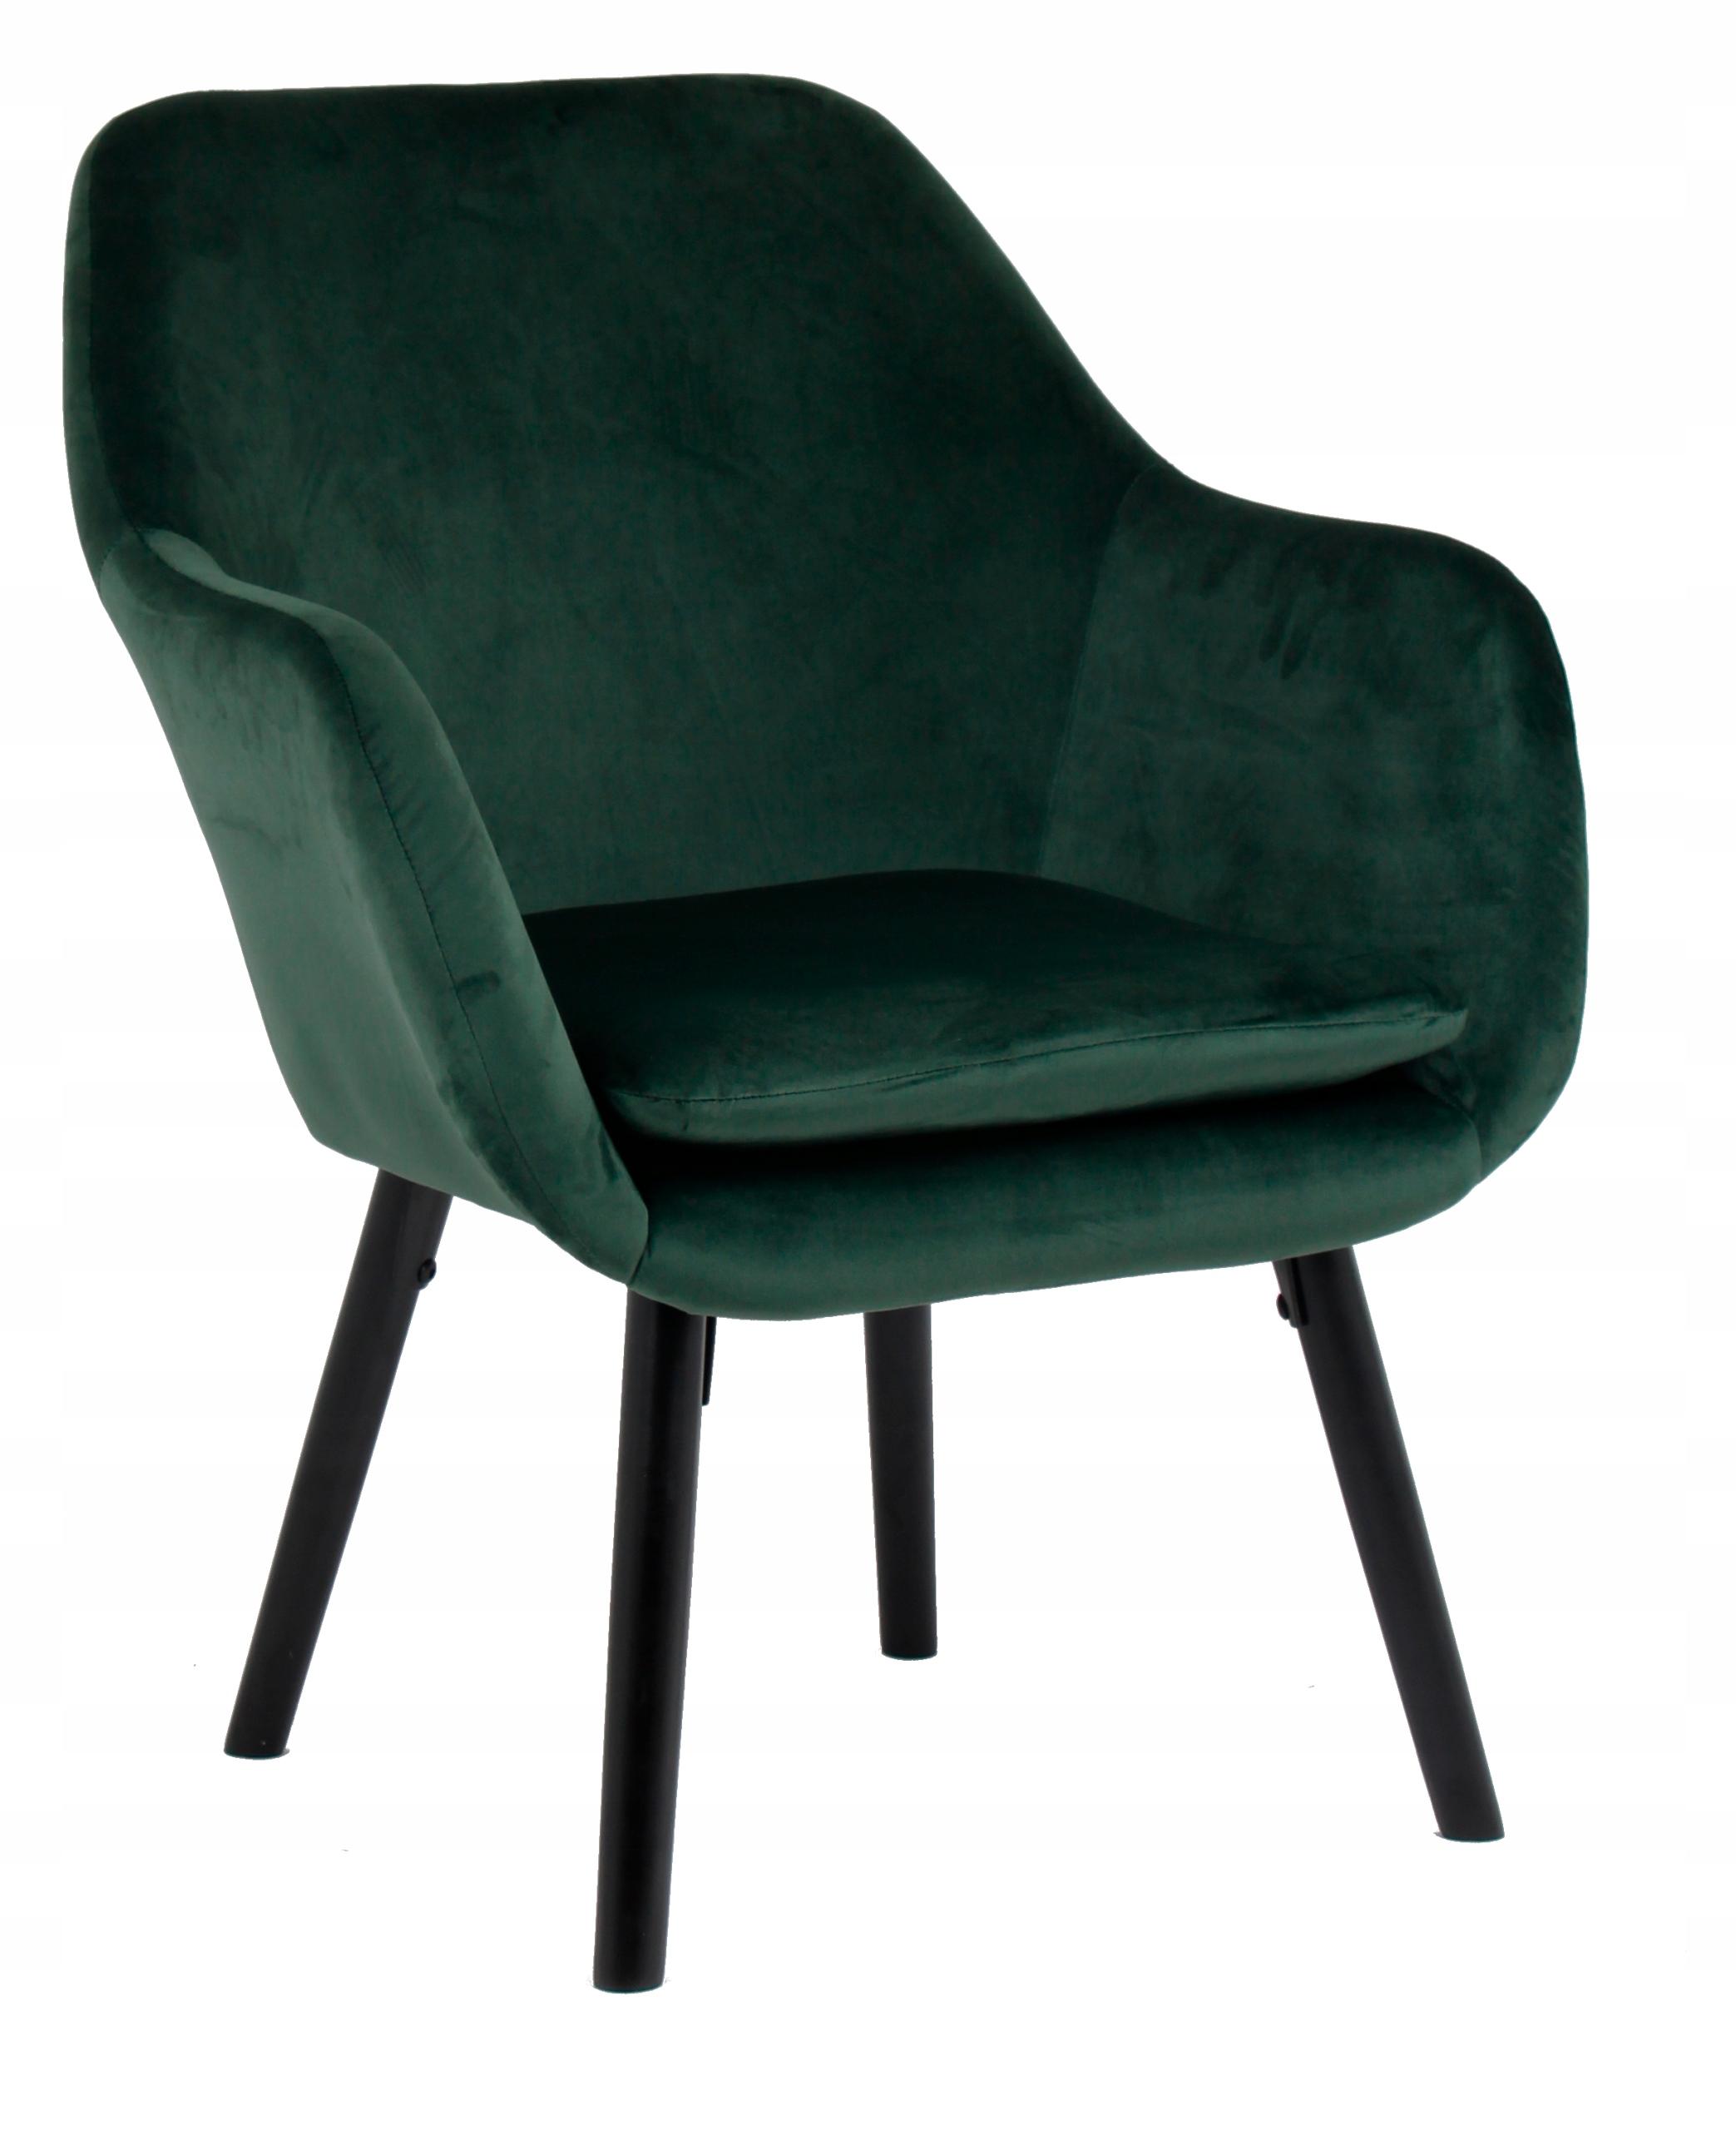 Мягкое кресло Boston 2 бархат темно-зеленый